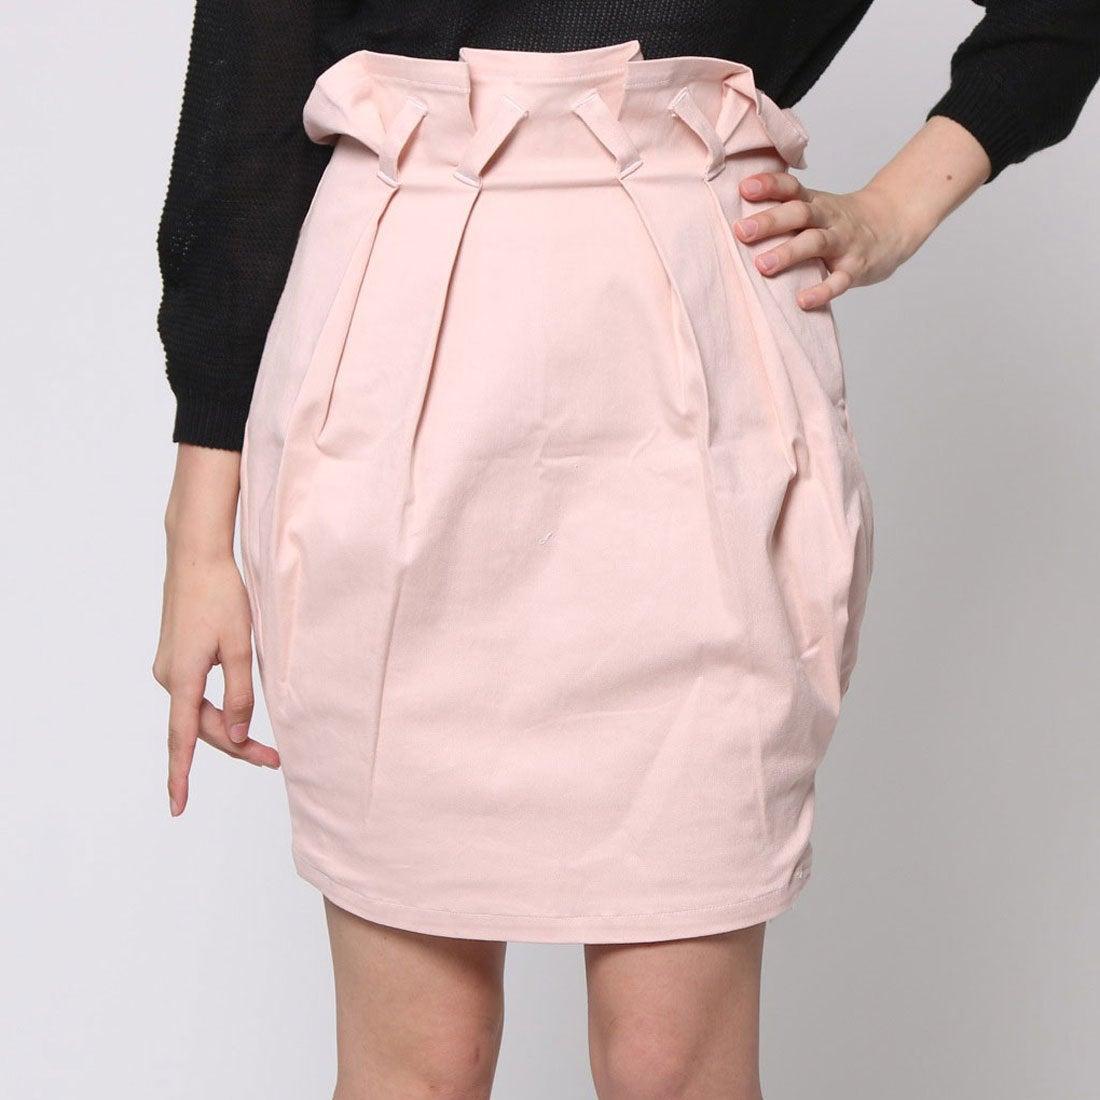 【SALE 80%OFF】アンチュール エミュ Unchulle' emu タックコクーンスカート (ピンク)